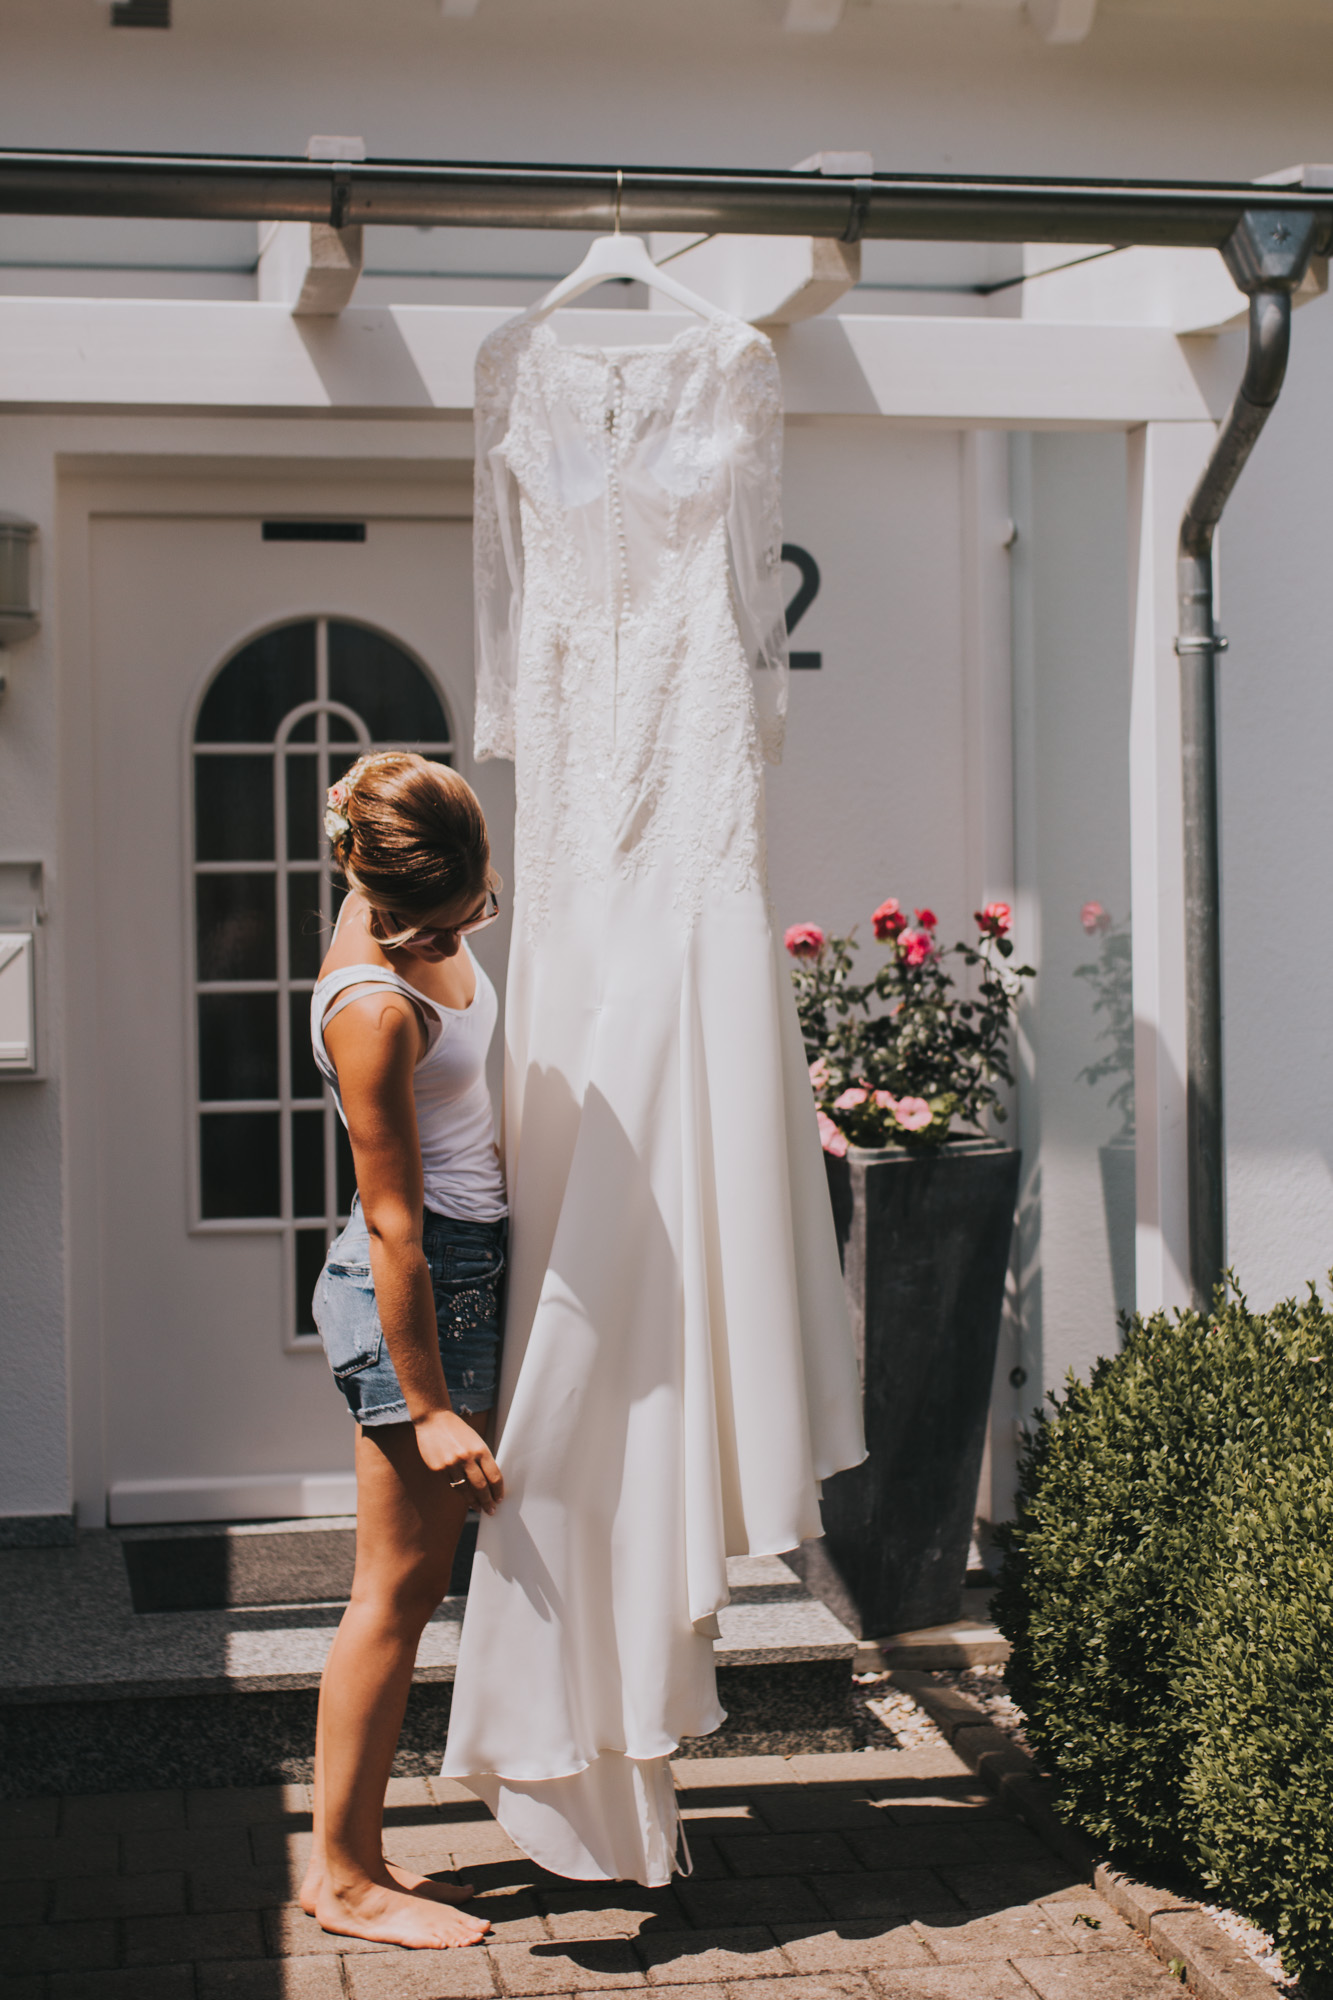 Hochzeit - Memory factory - 20180616-0004.jpg